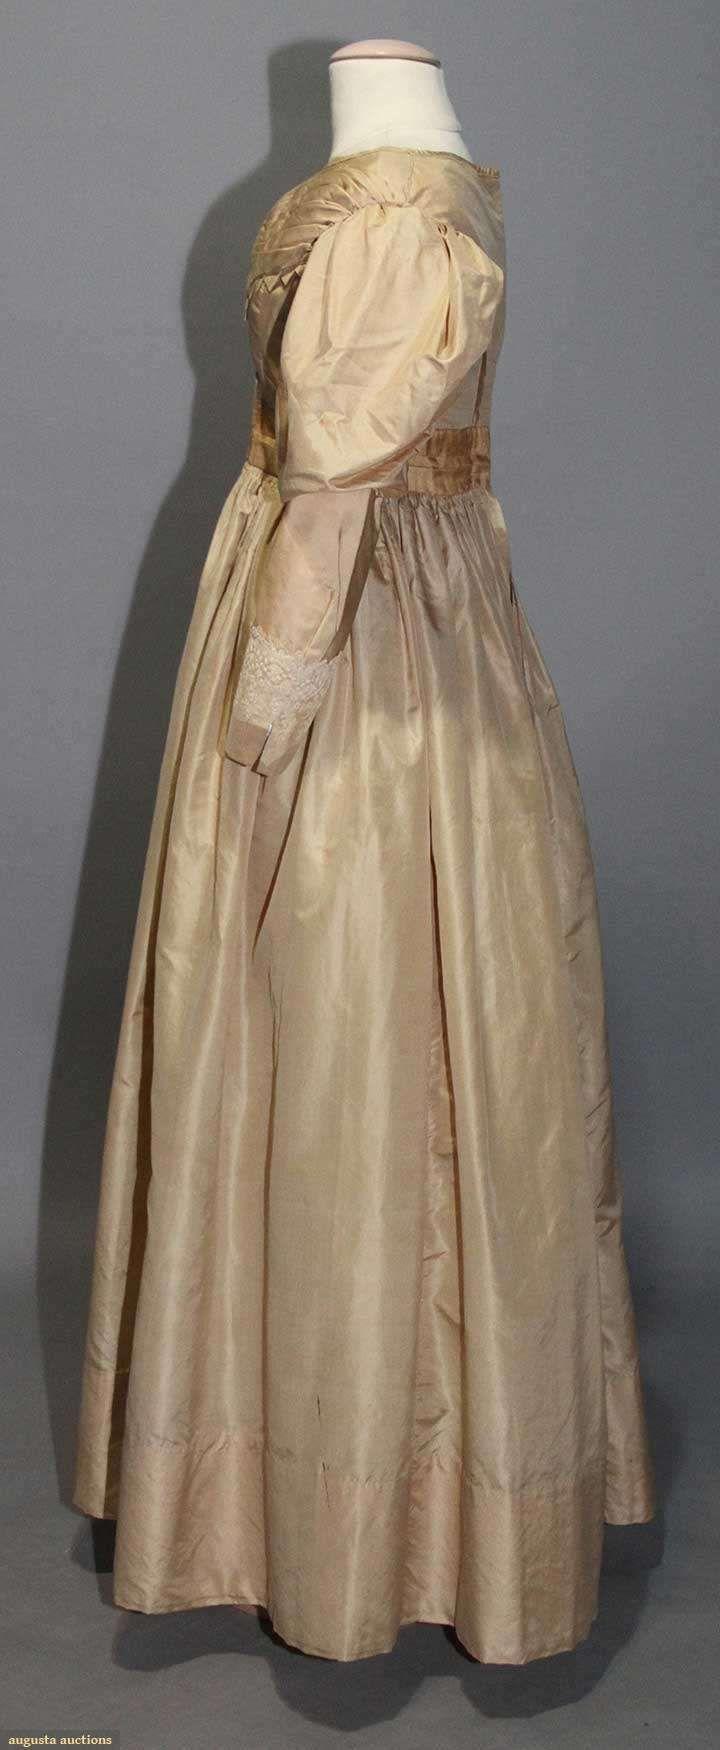 Day dress image taffeta augusta auctions may